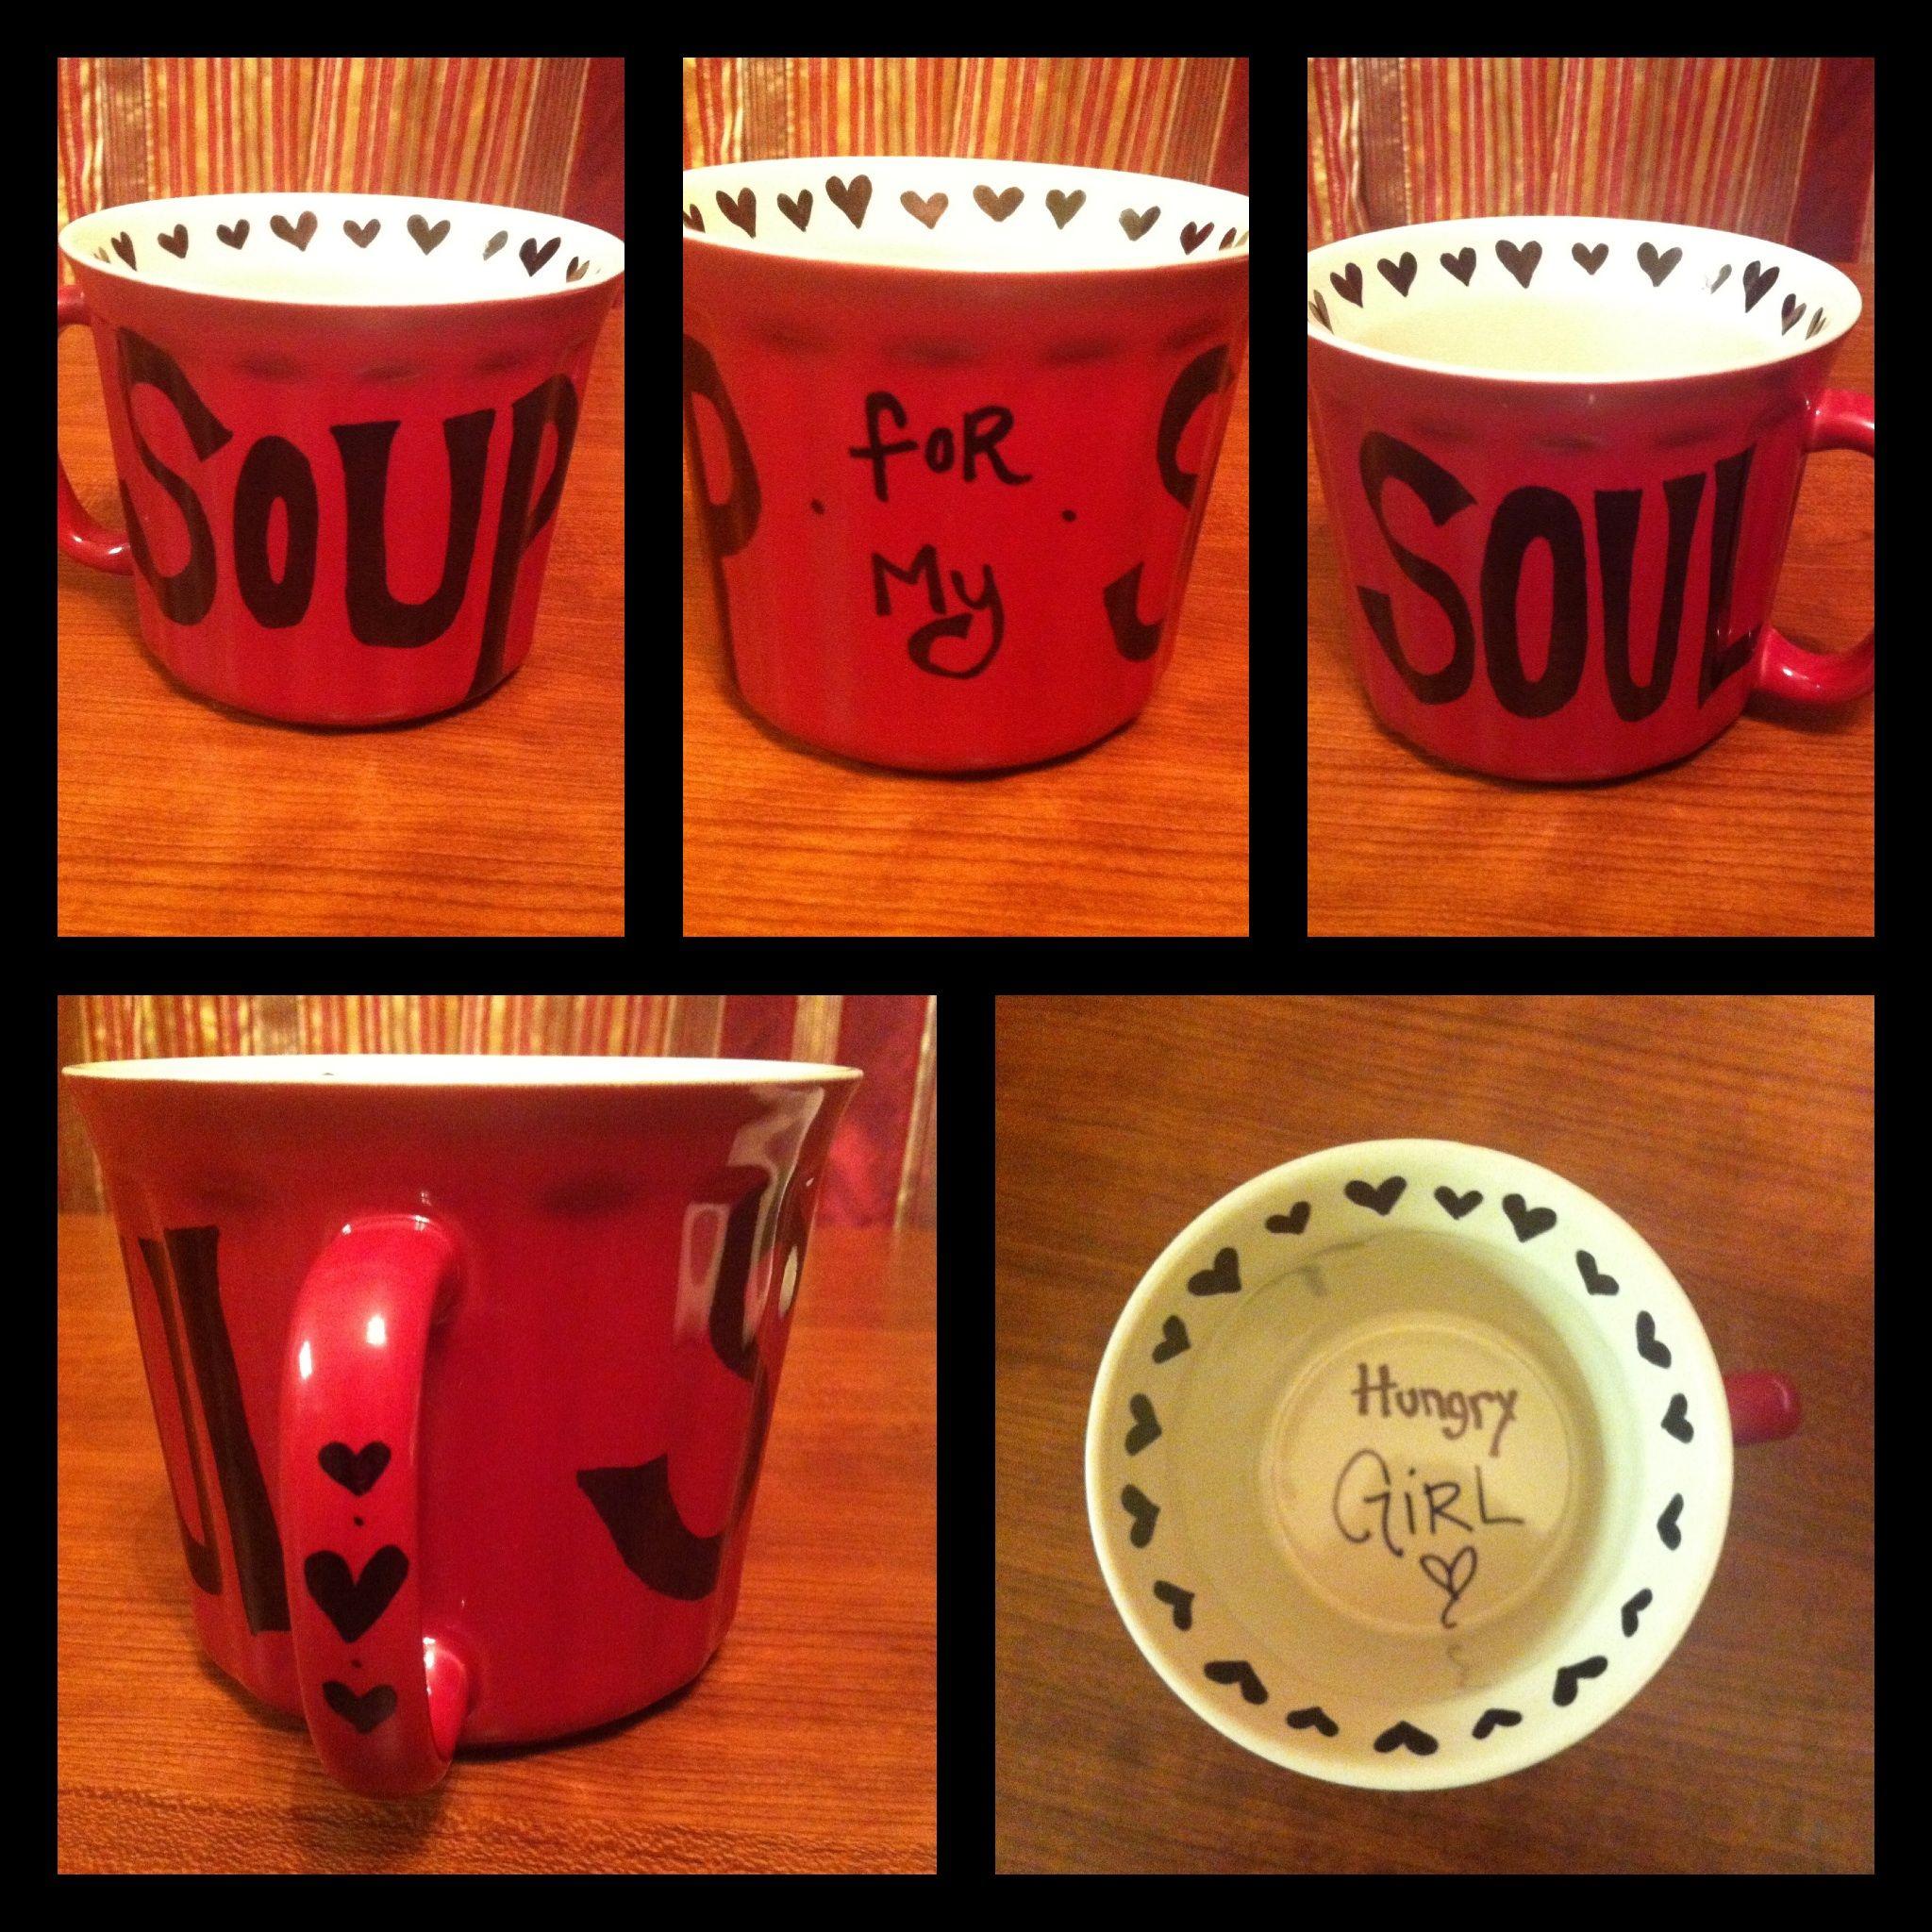 My new soup mug I made <3 Permanent marker.. Bake at 350 degrees for 30 minutes :D